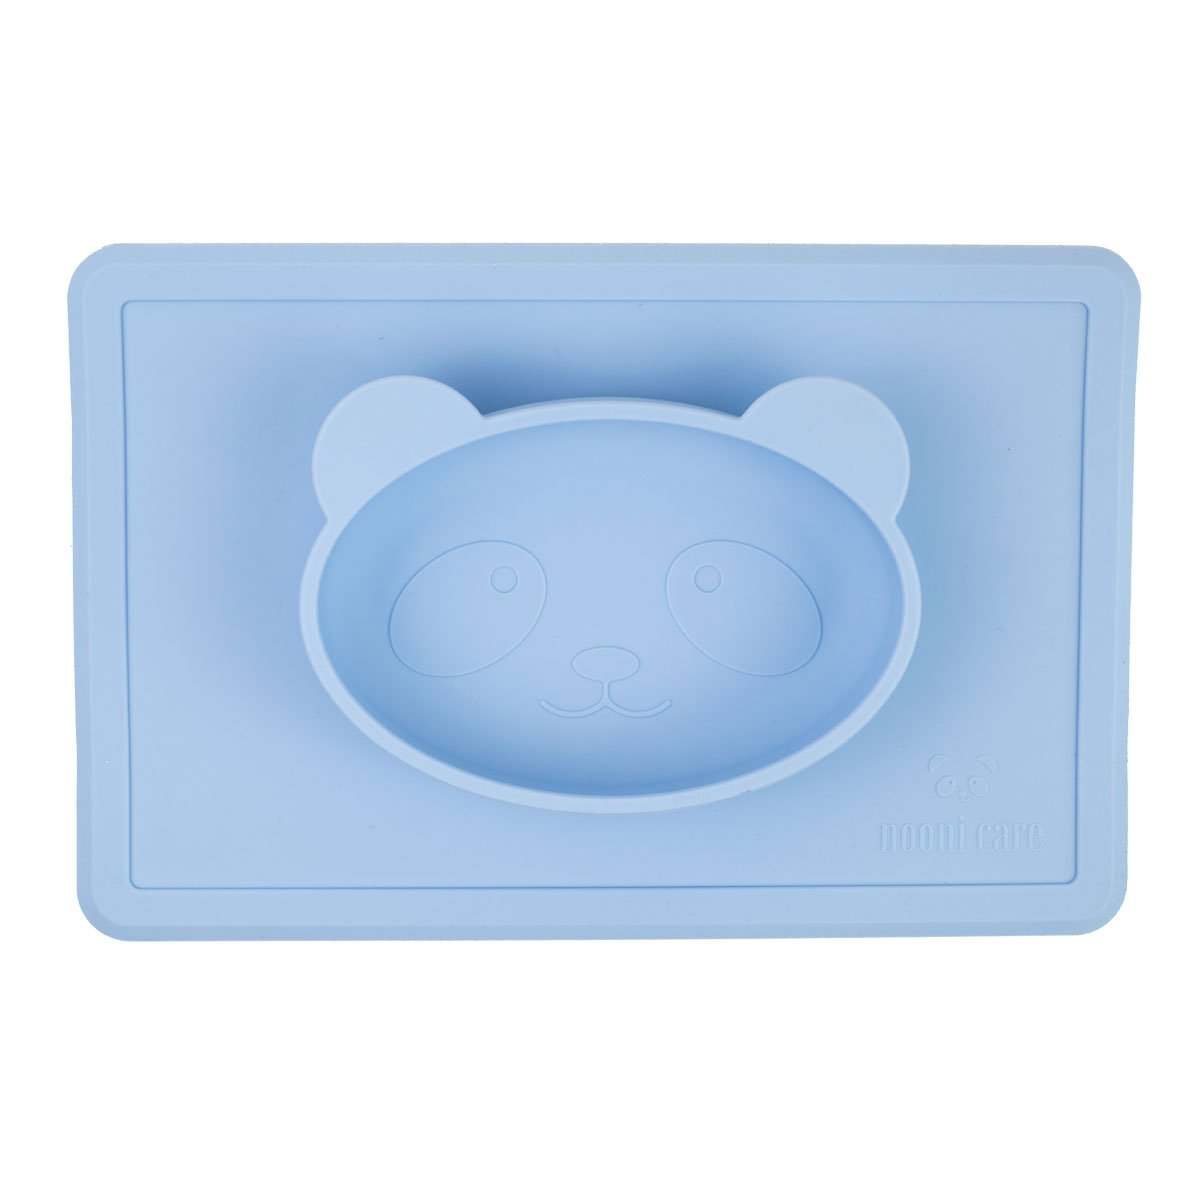 Nooni Care Baby Teller Mini Silikon Ansaugmatten Schussel Tischset fur den Hochstuhl